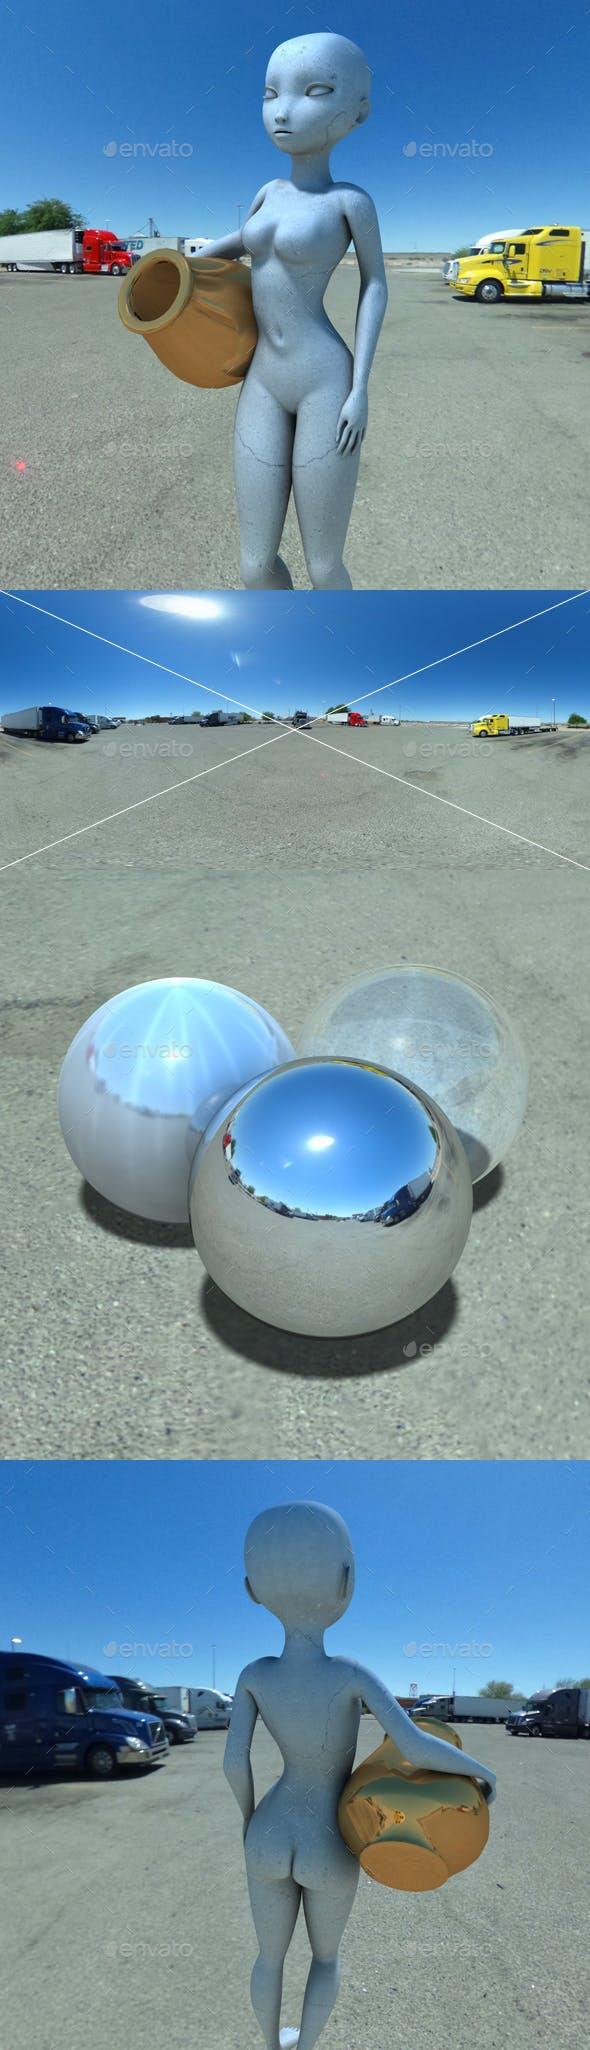 Truck Stop Blue Sky HDRI - 3DOcean Item for Sale